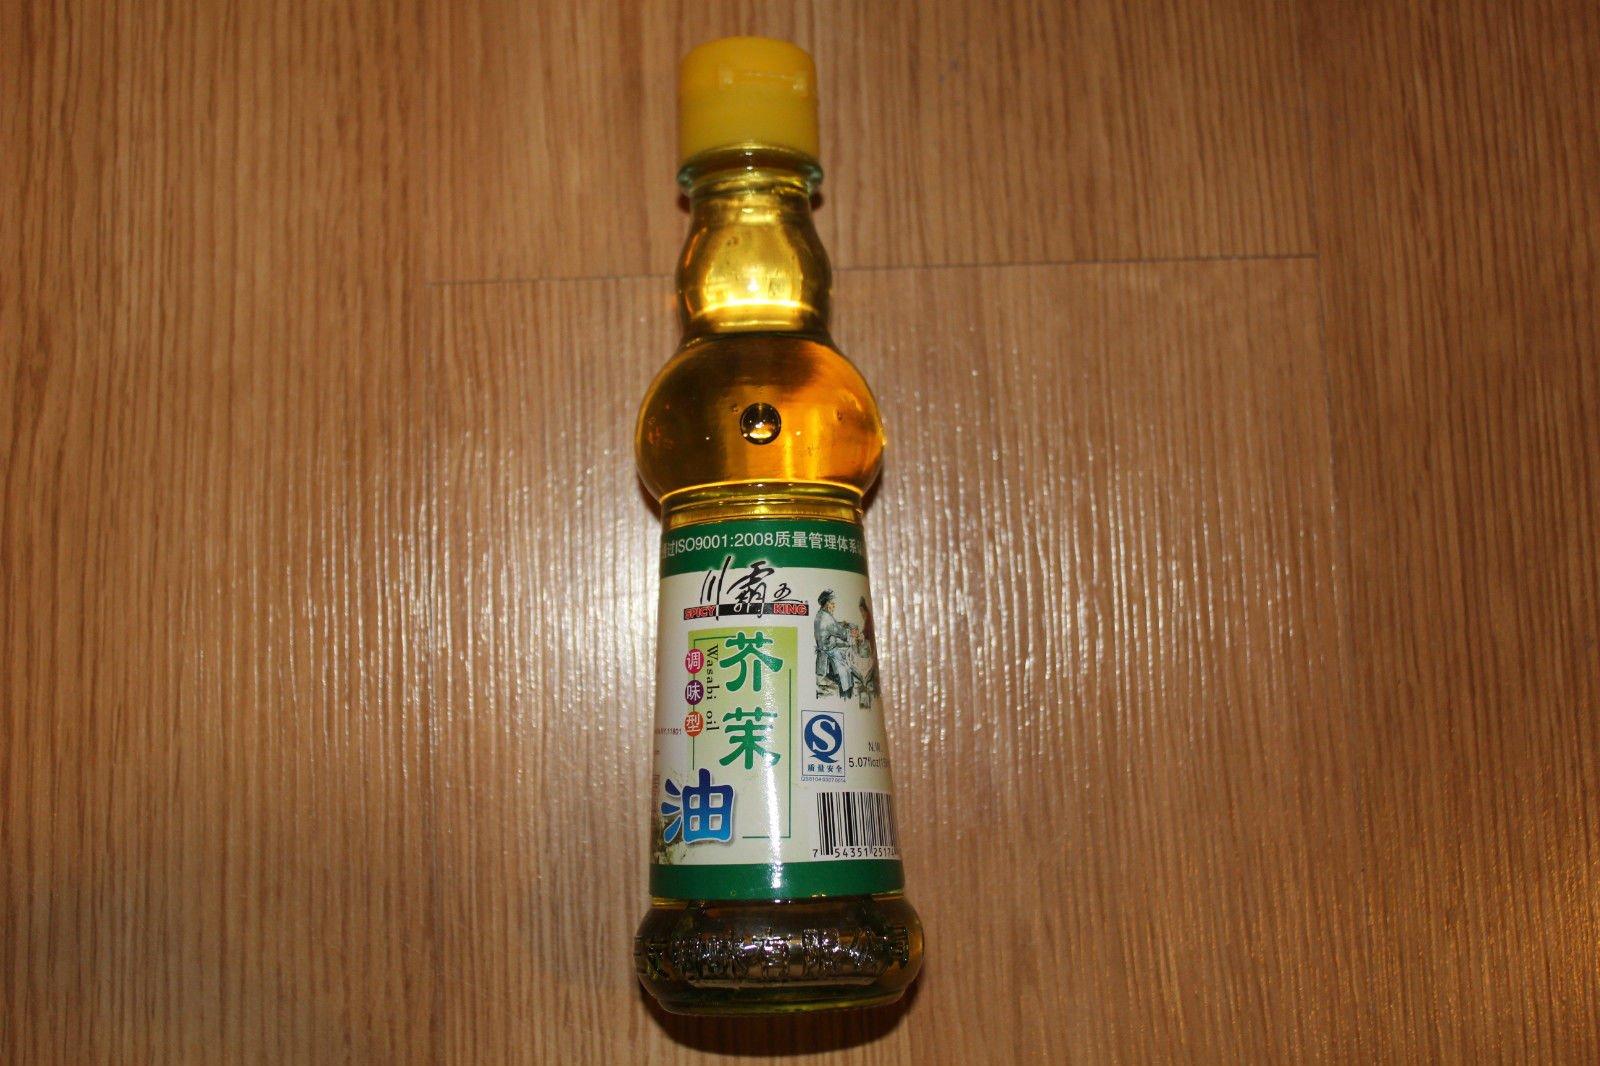 Spicy King-wasabi Oil 5.07oz